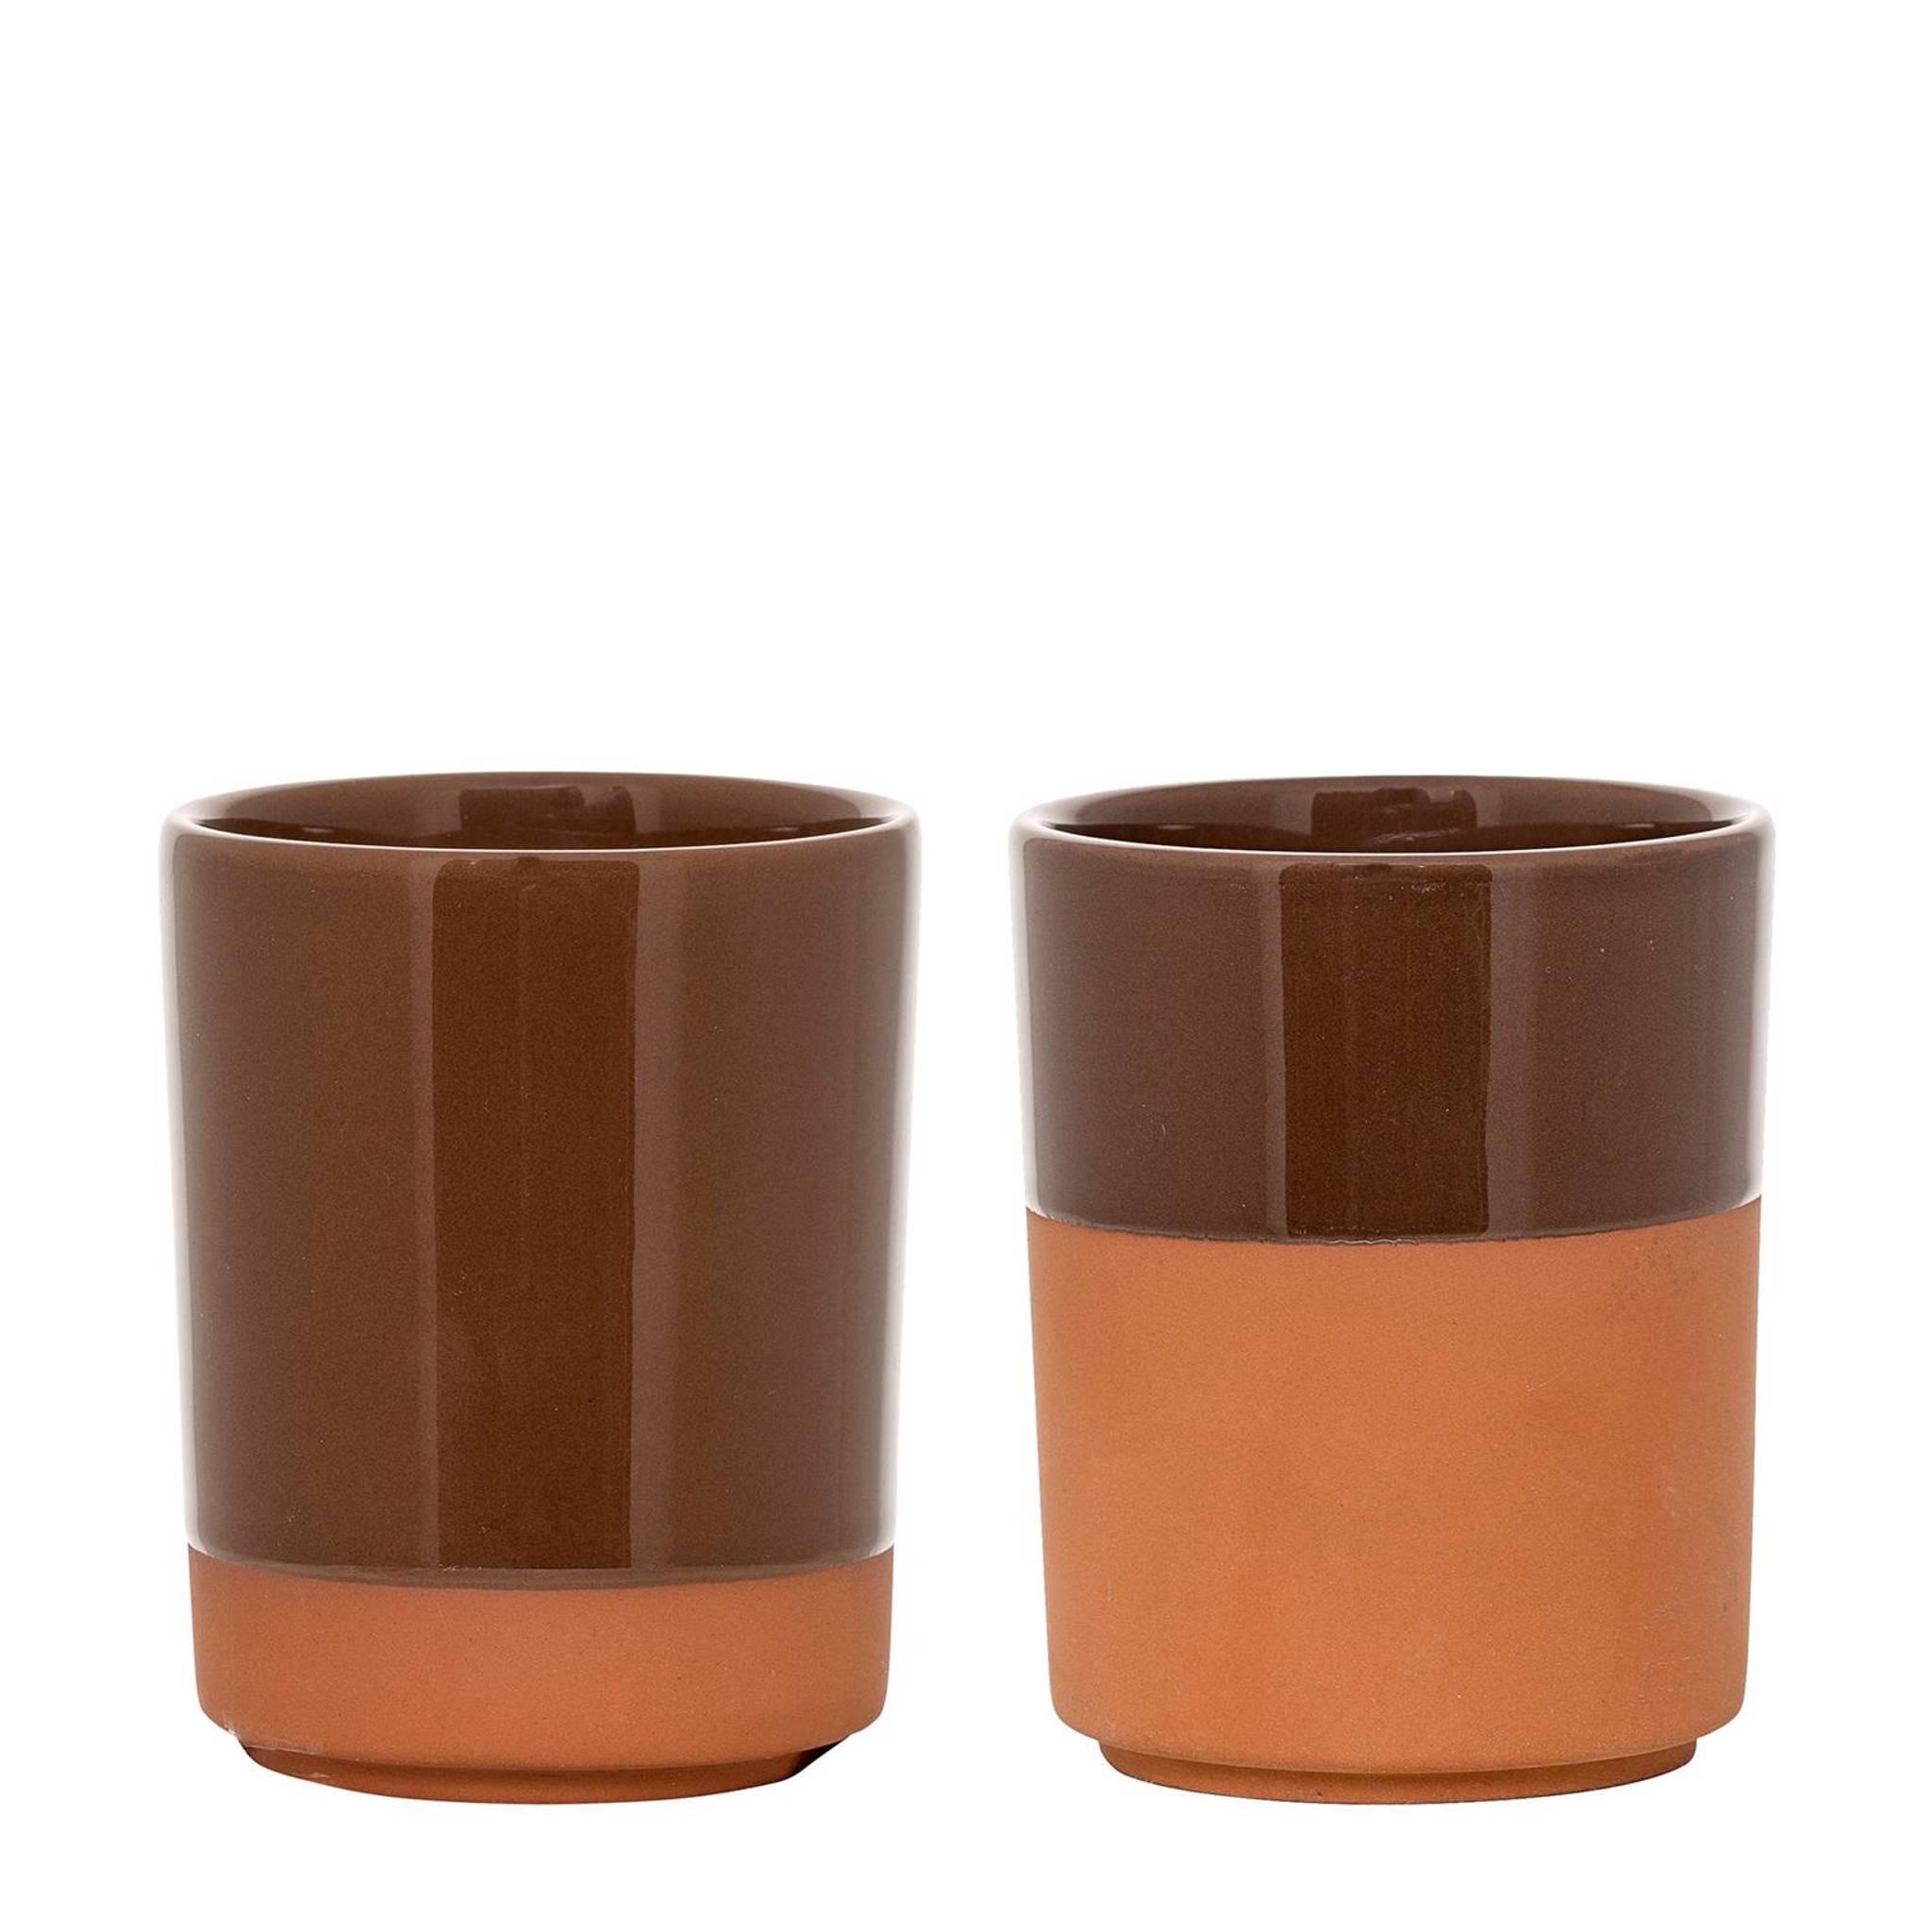 Tasse en terre cuite orange - Lot de 2